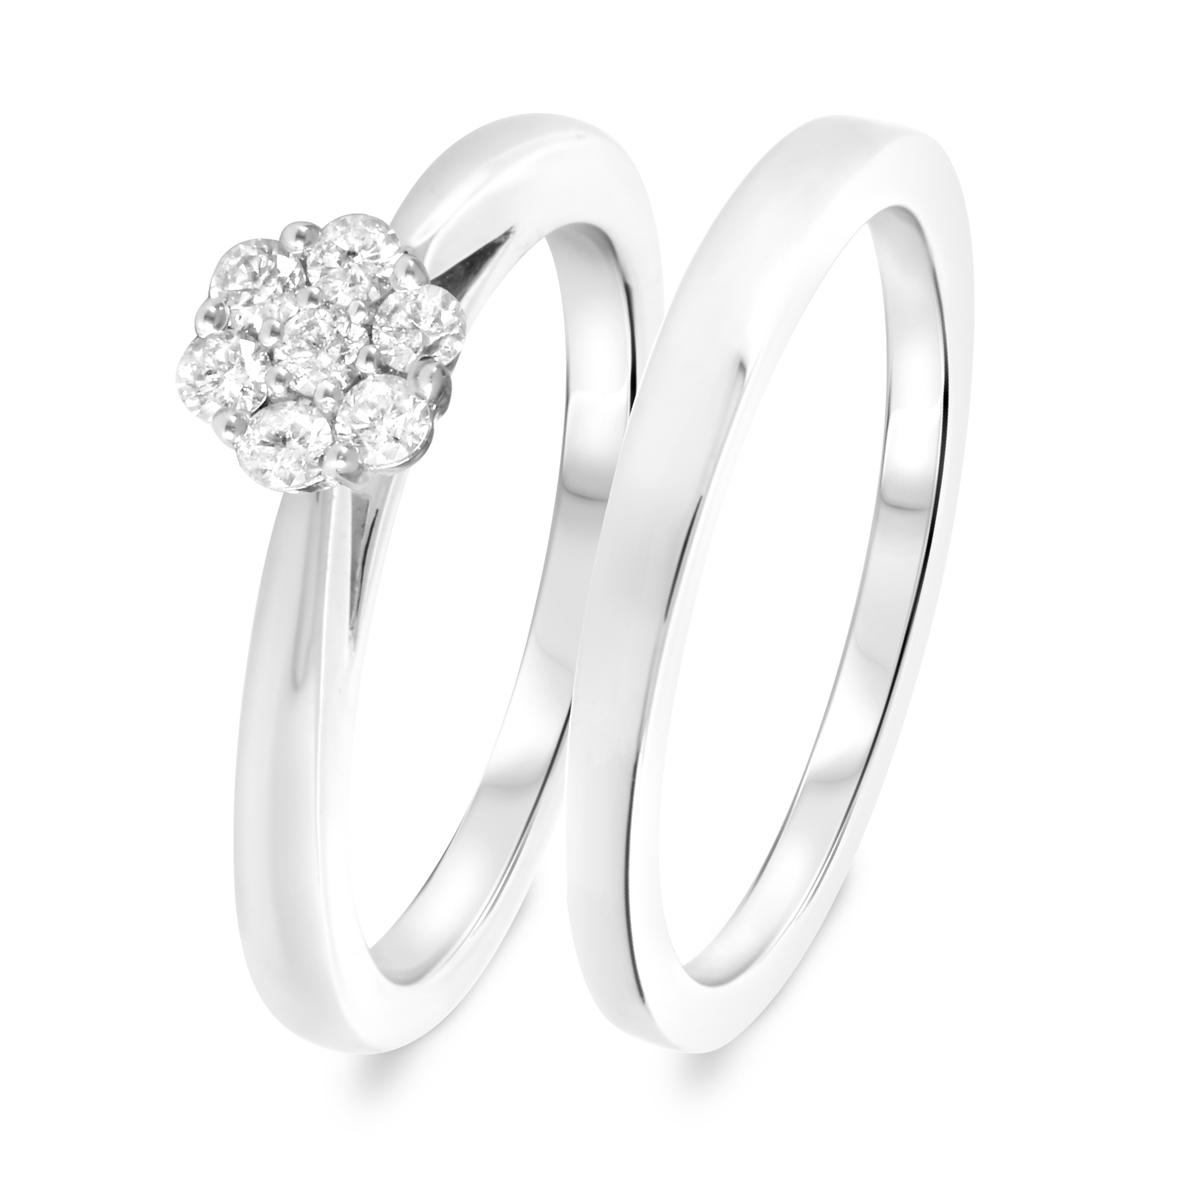 1/3 CT. T.W. Diamond Women's Bridal Wedding Ring Set 10K White Gold